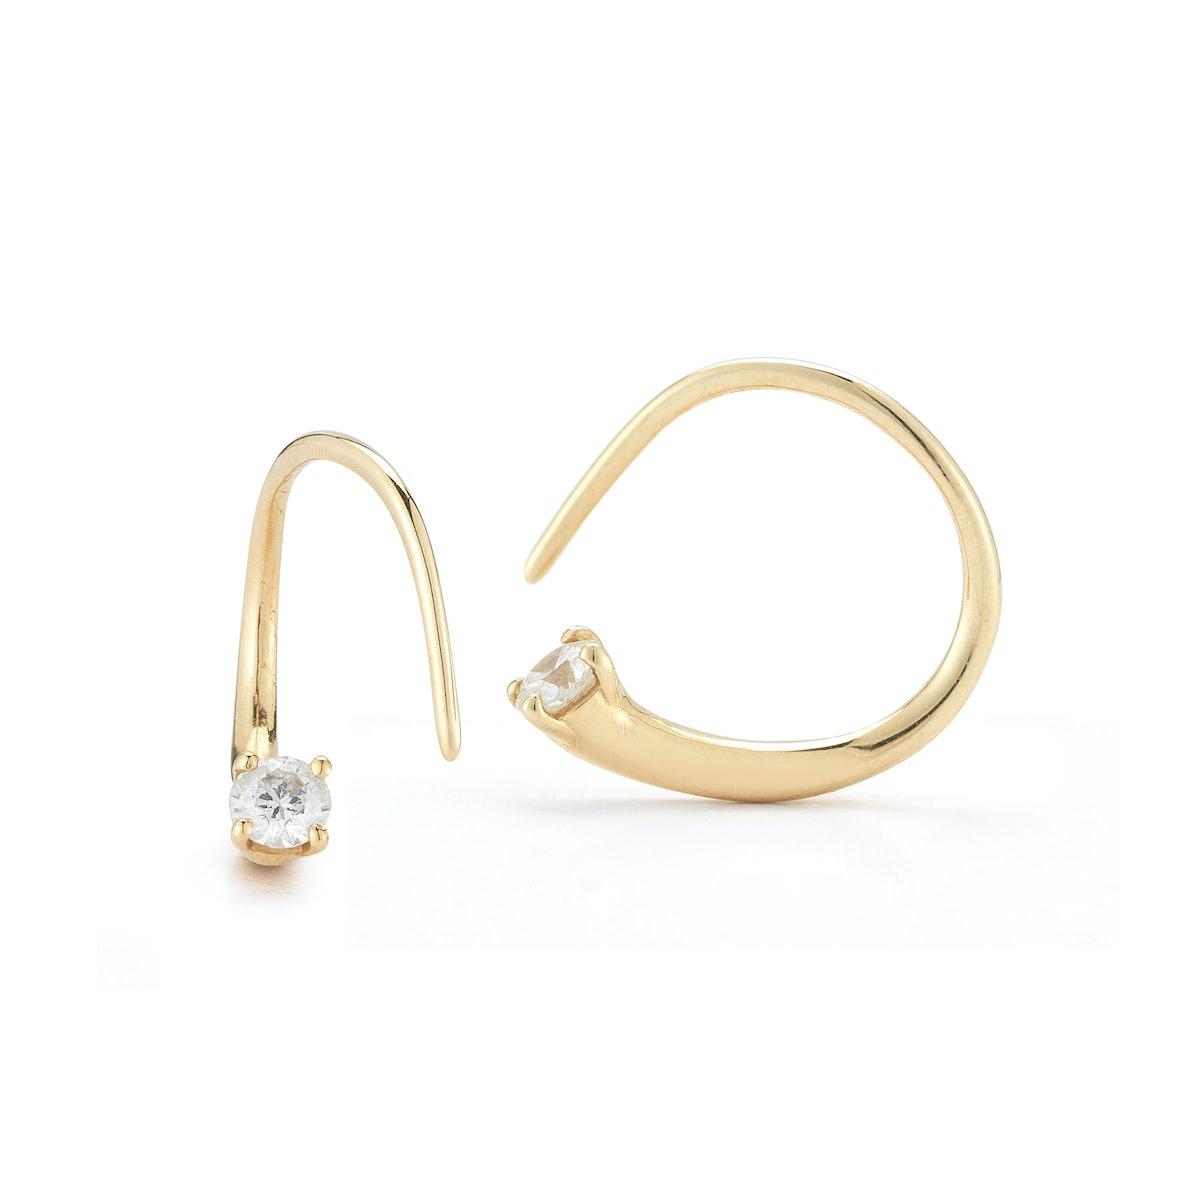 Jade Trau 14k yellow and diamond earrings